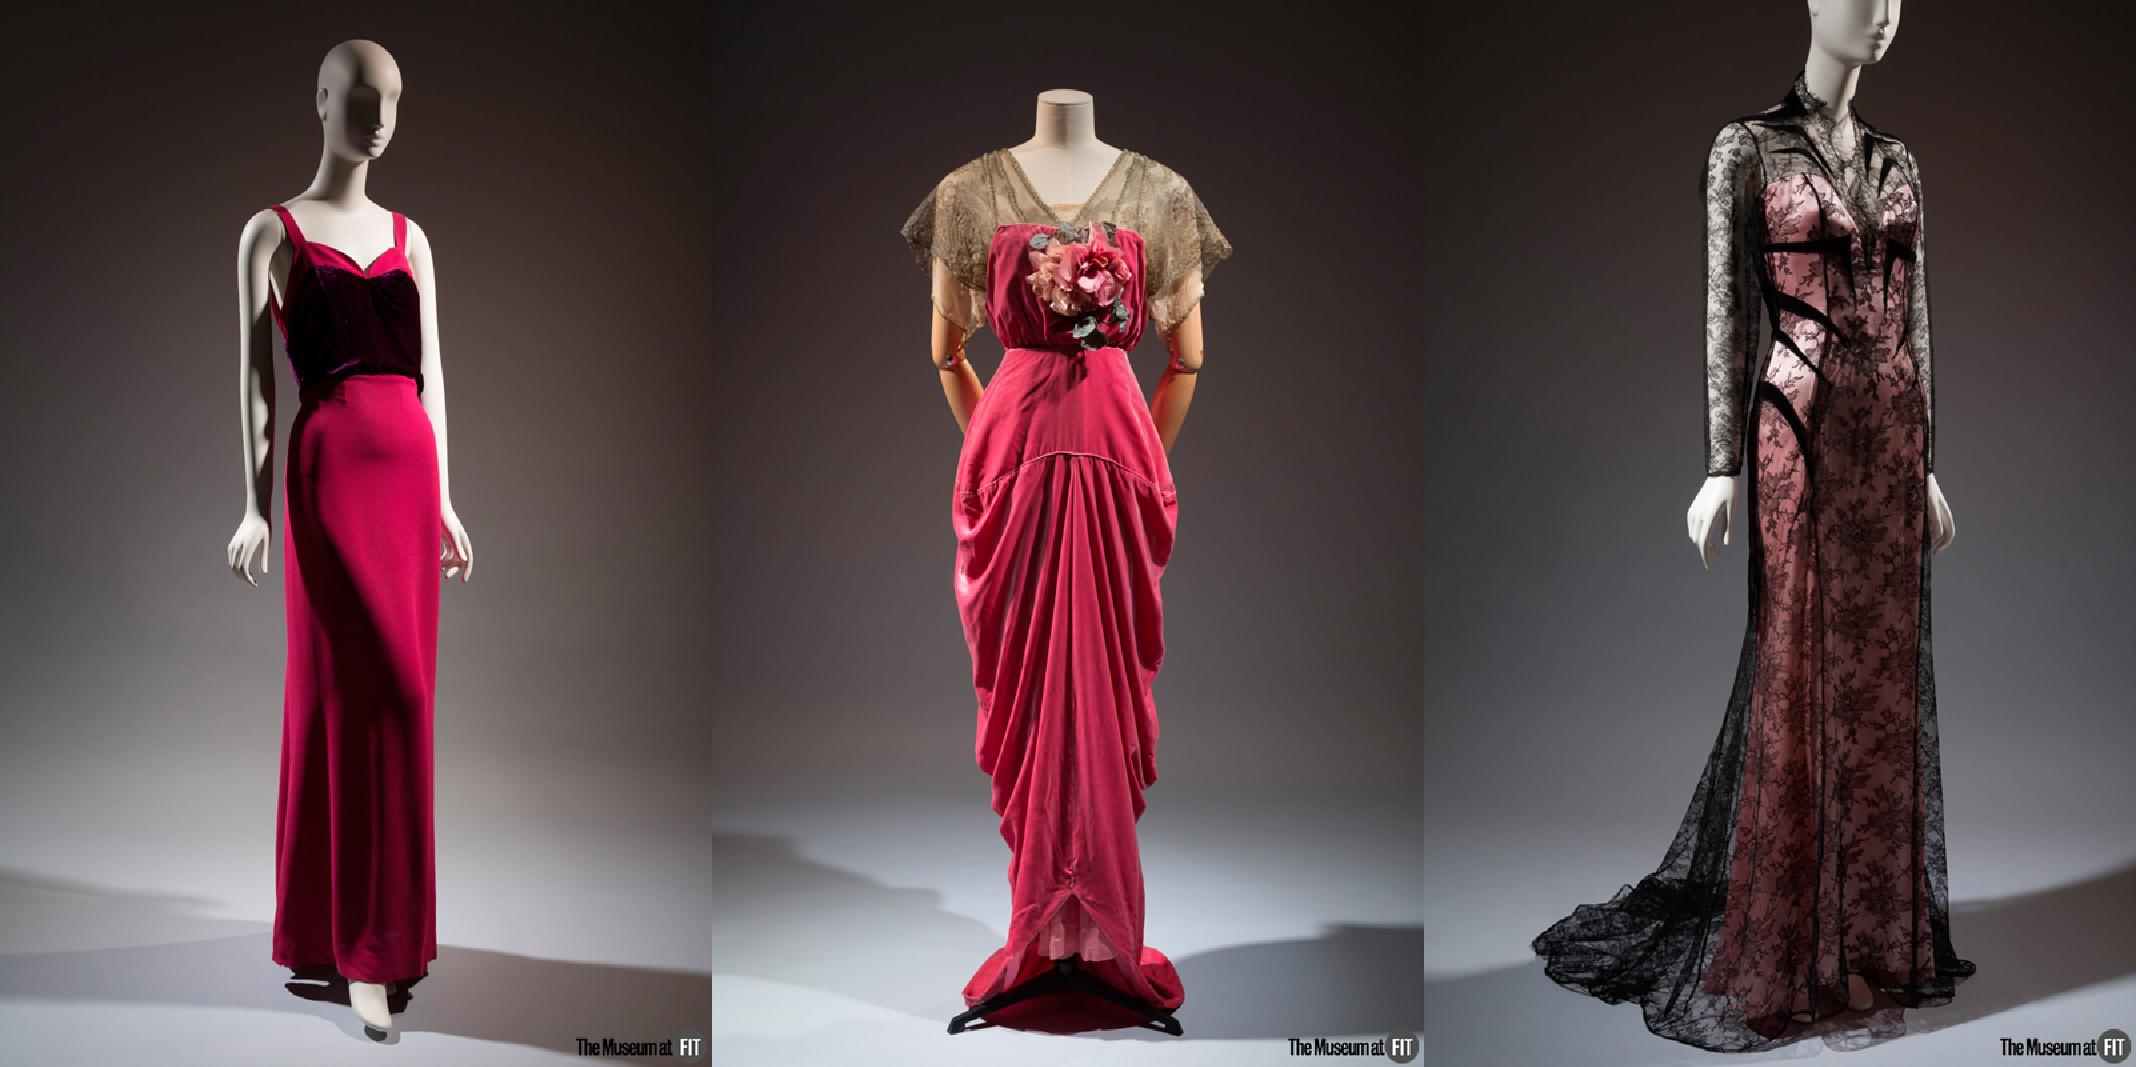 Elsa Schiaparelli gown - Summer 1937, Museum Purchase. Robert evening gown - 1910-1914, France, Museum Purchase.  Thierry Mugler evening gown - 1994, Museum Purchase.